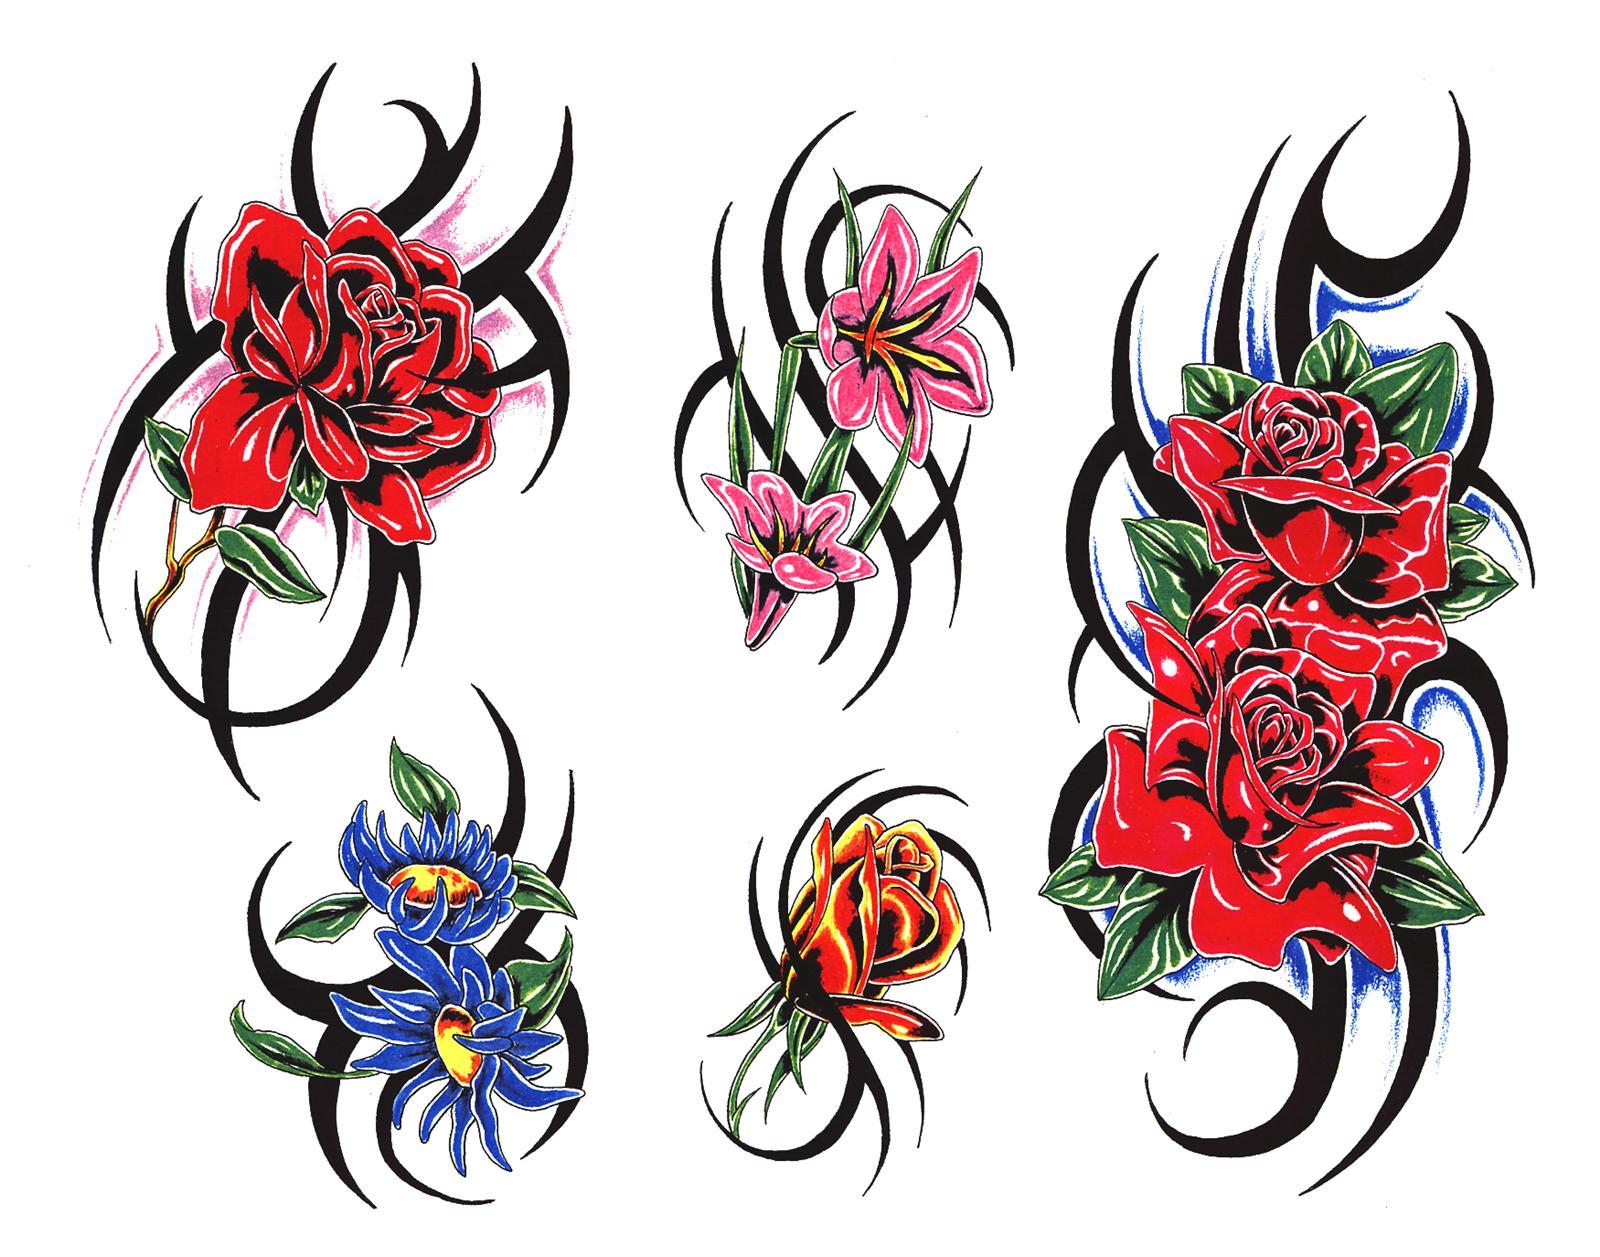 Motiv Tetov 225 N 237 Růže 816